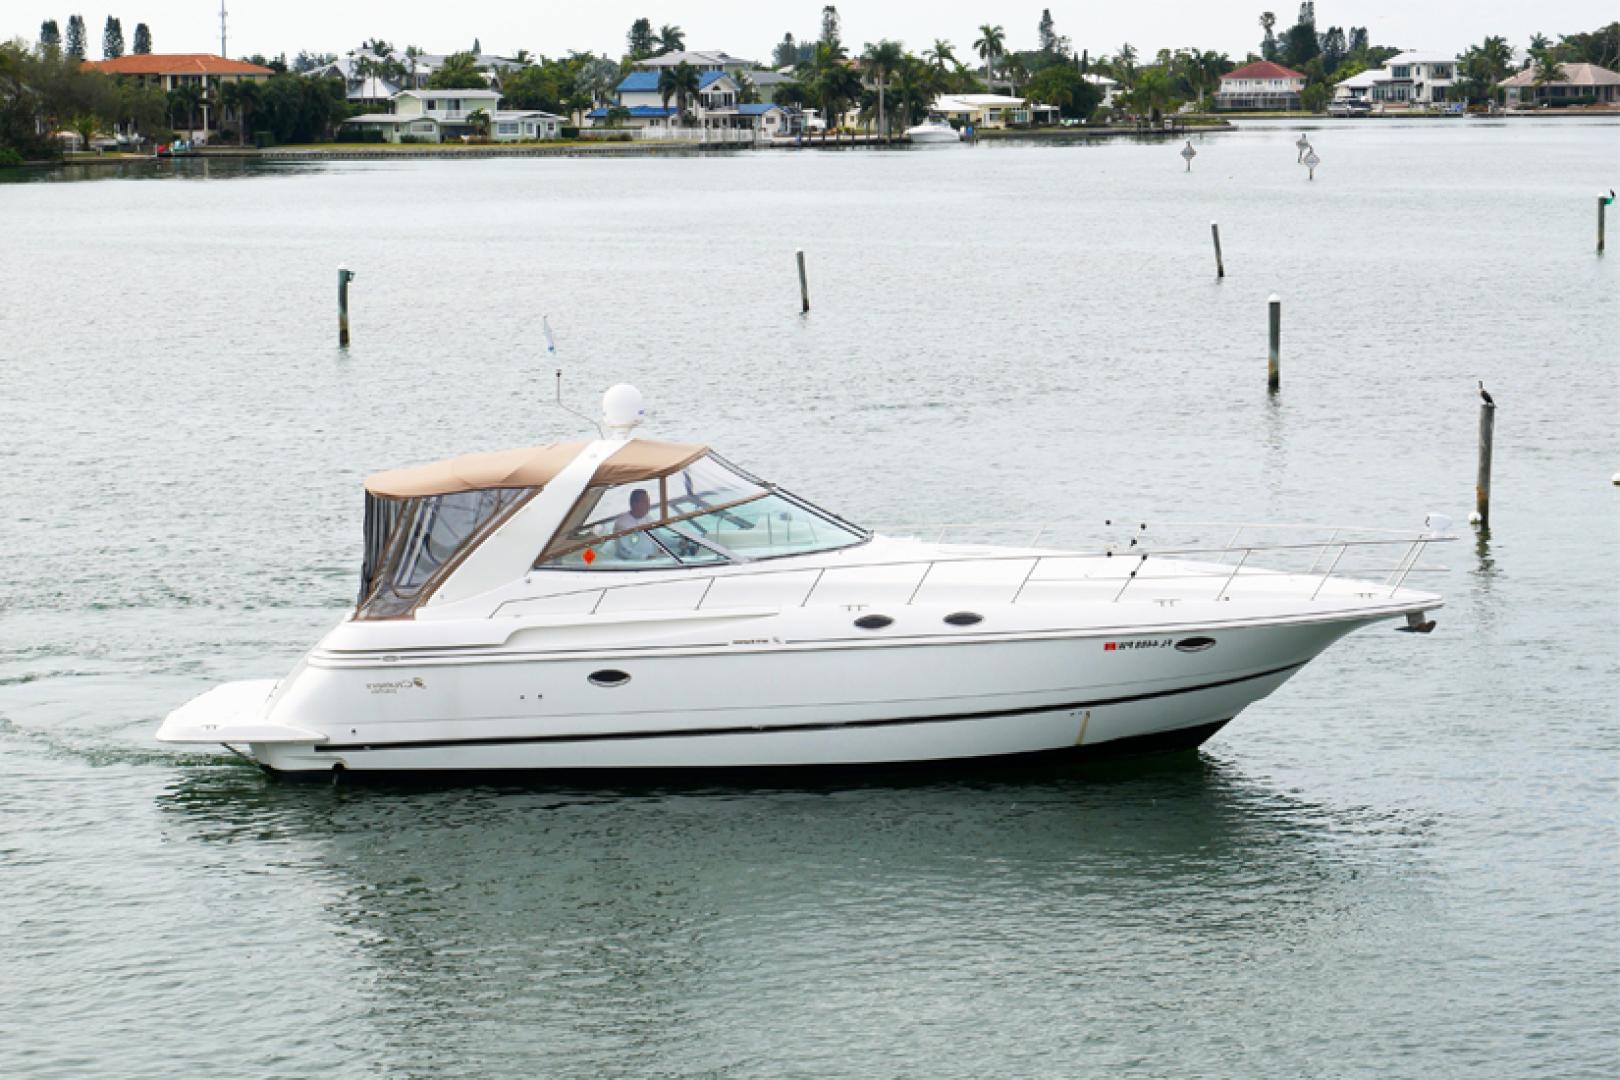 Cruisers-3870 Express 2000-CDreams Destin-Florida-United States-2000 38 Cruisers CDreams-1178101 | Thumbnail